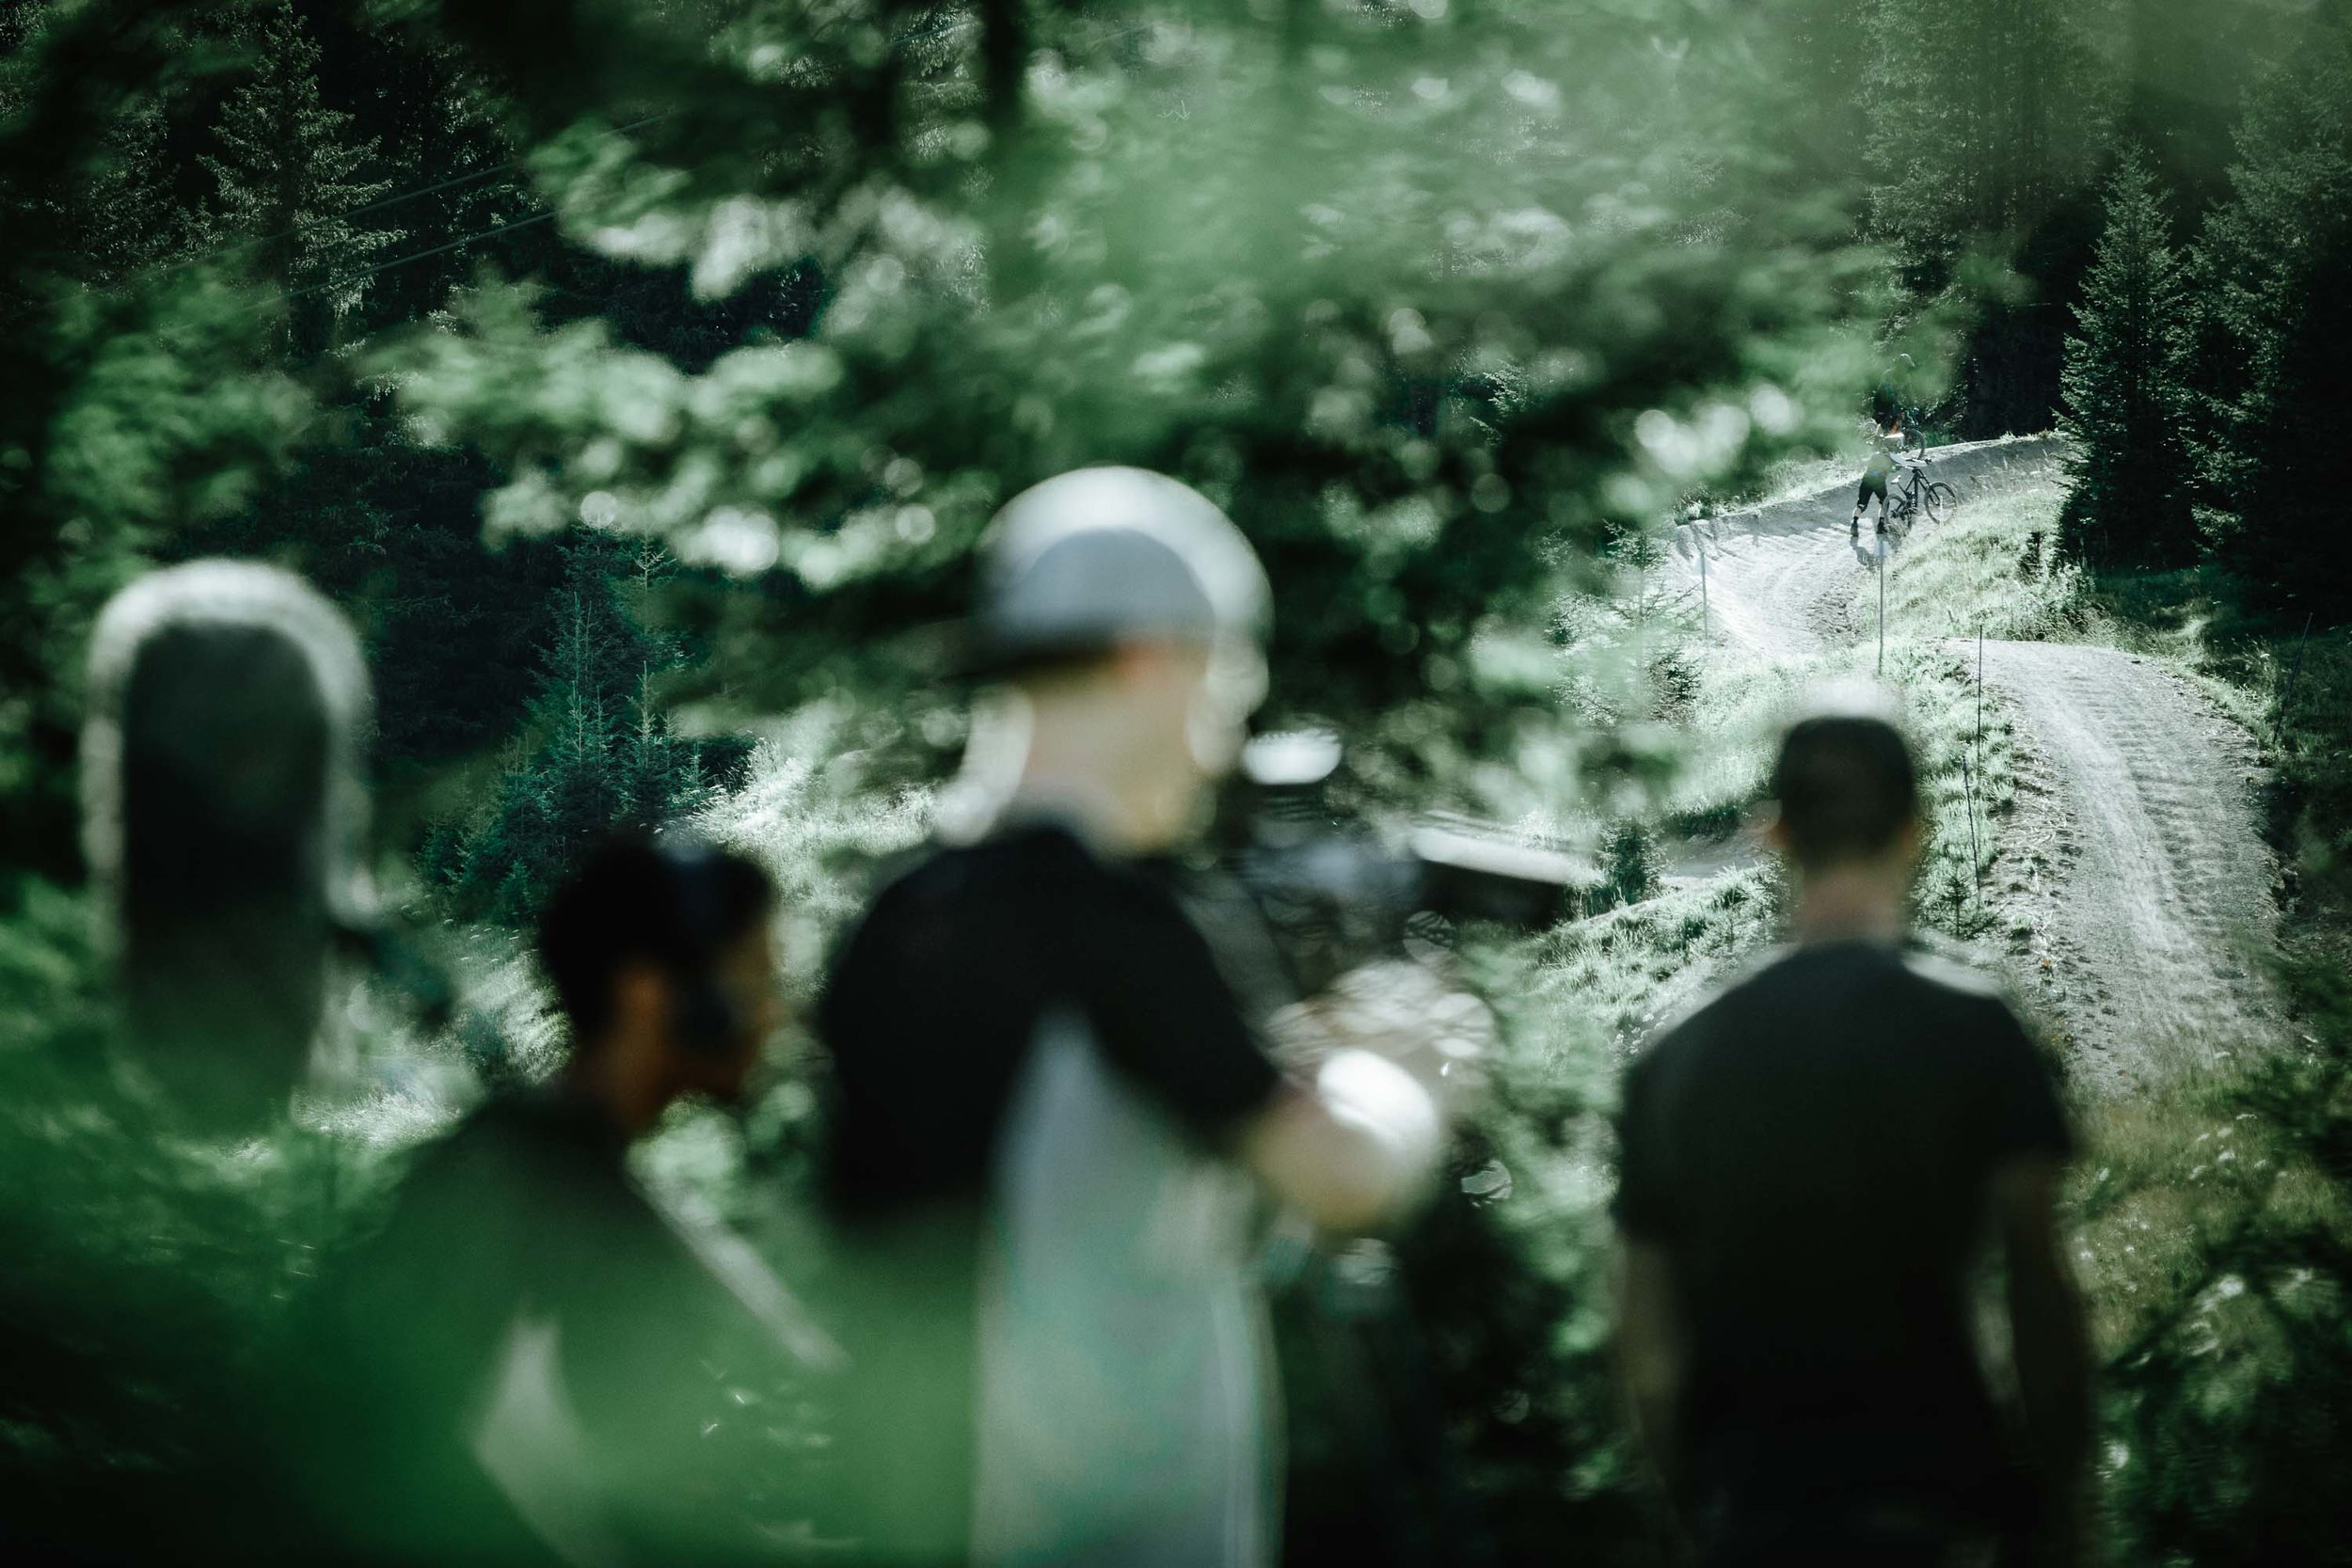 2017-10-09-@jmvotography-julian-mittelstaedt-fotograf-muenchen-foto-photo-9V2B6785.jpg